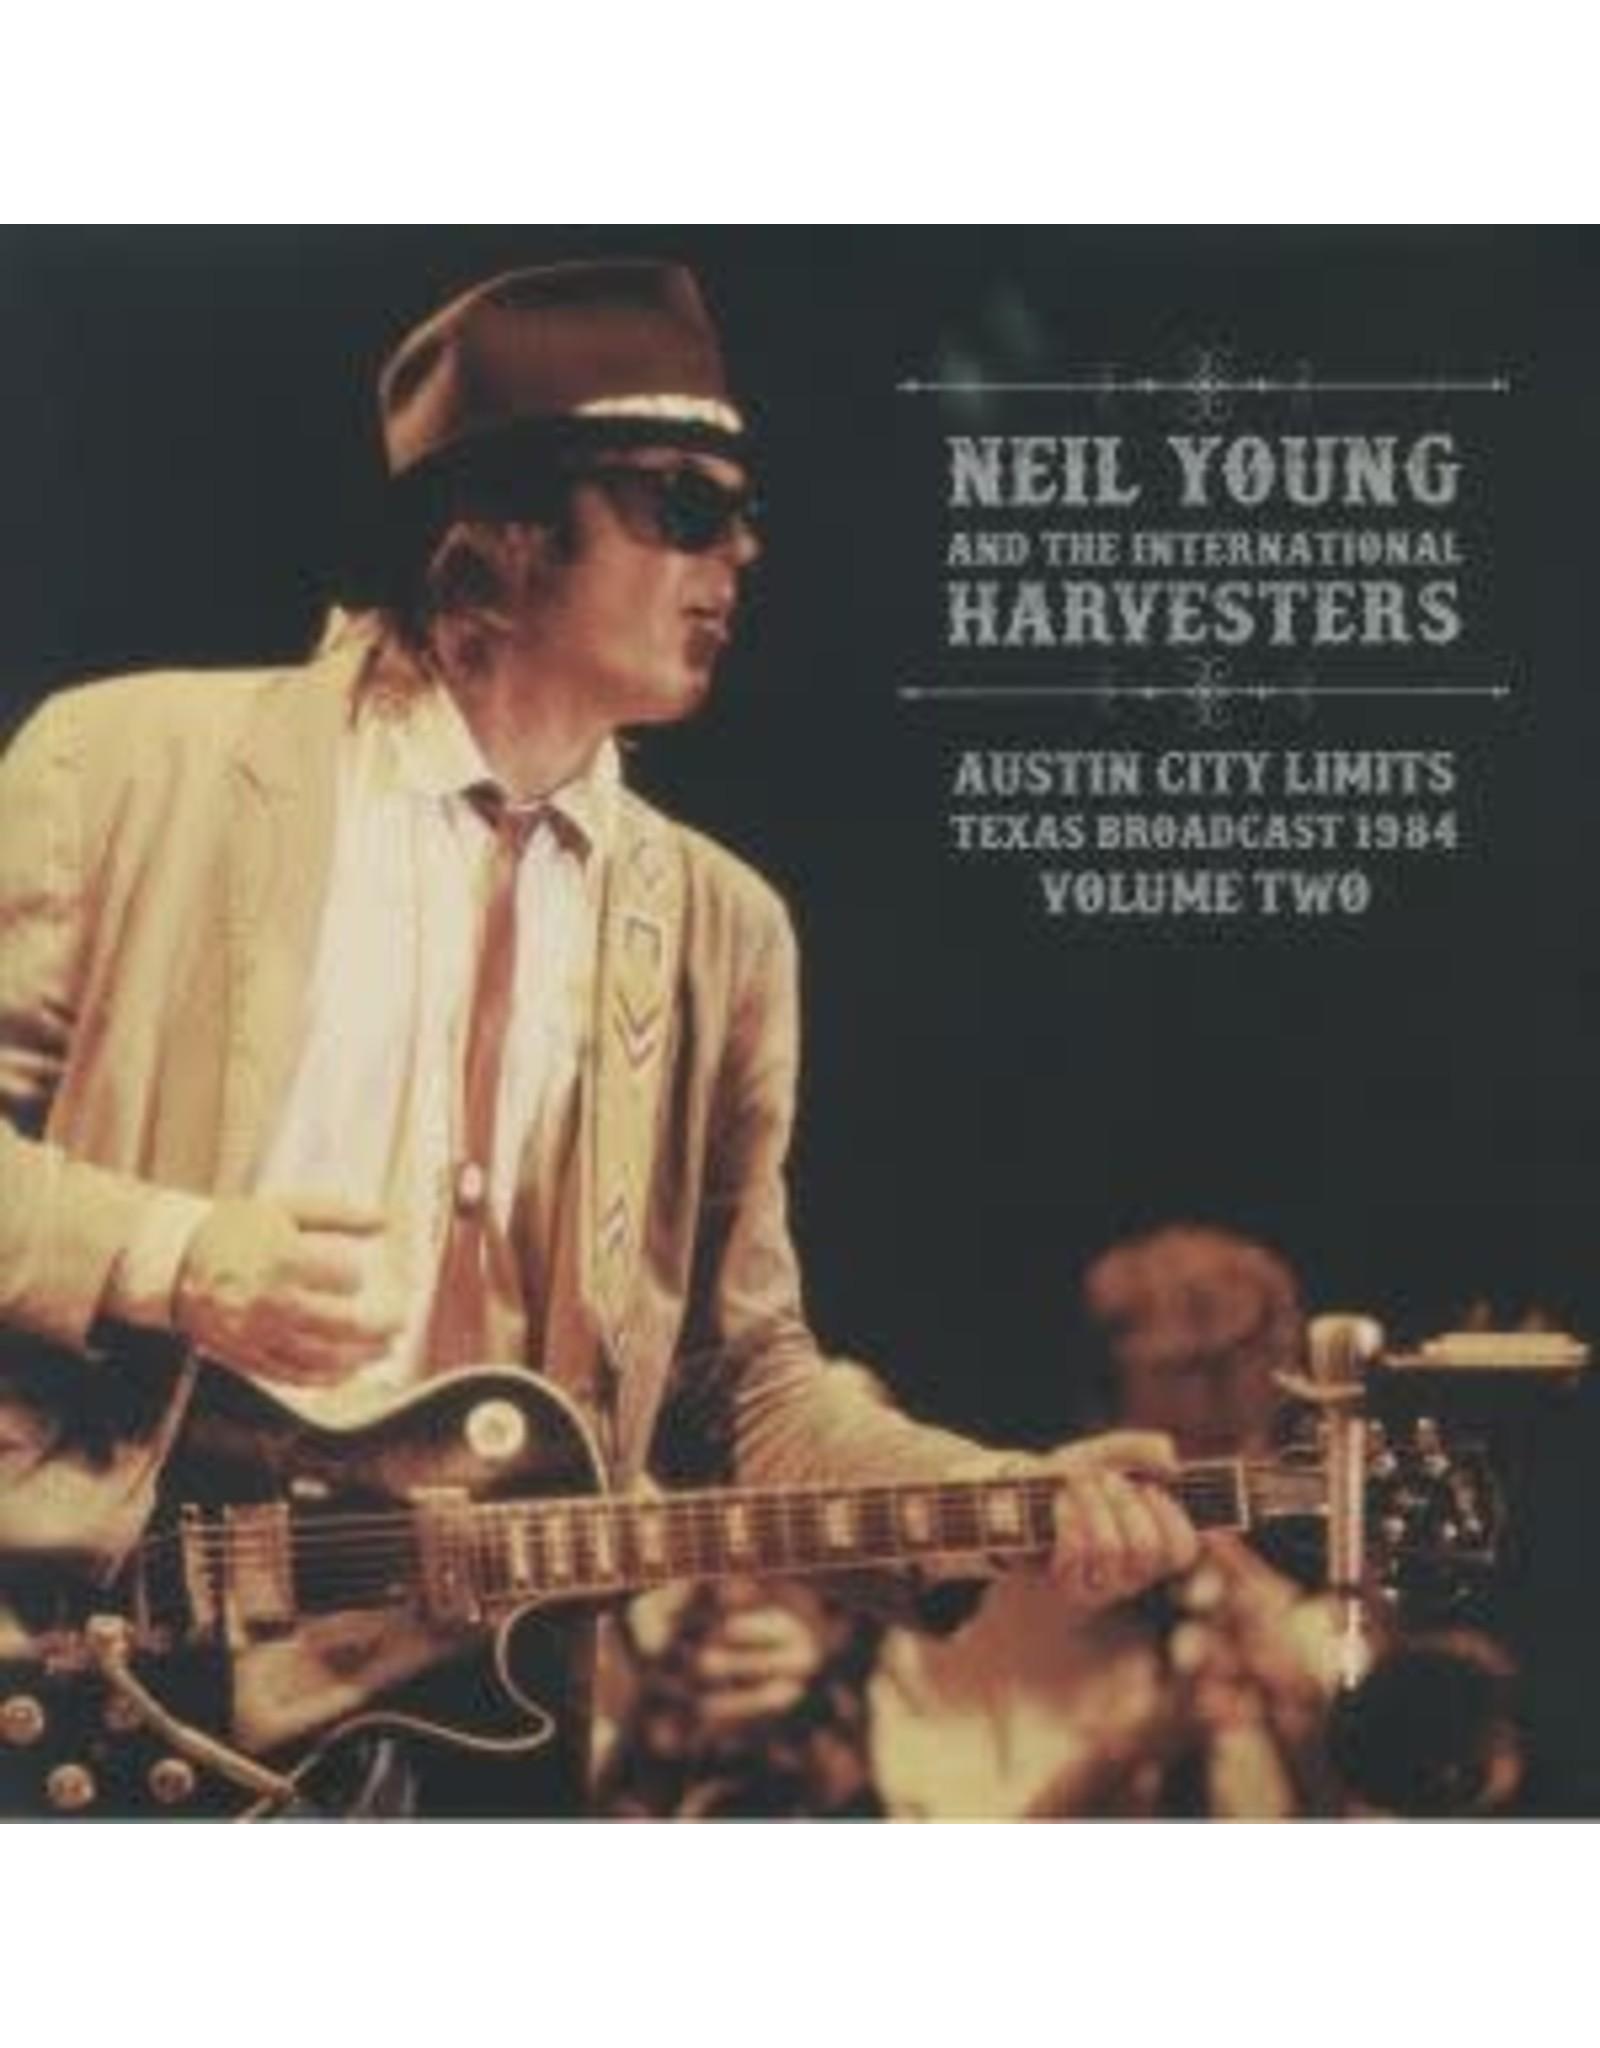 New Vinyl Neil Young & The International Harvesters - Austin City Limits Texas Braodcast 1984 Vol. 1 2LP